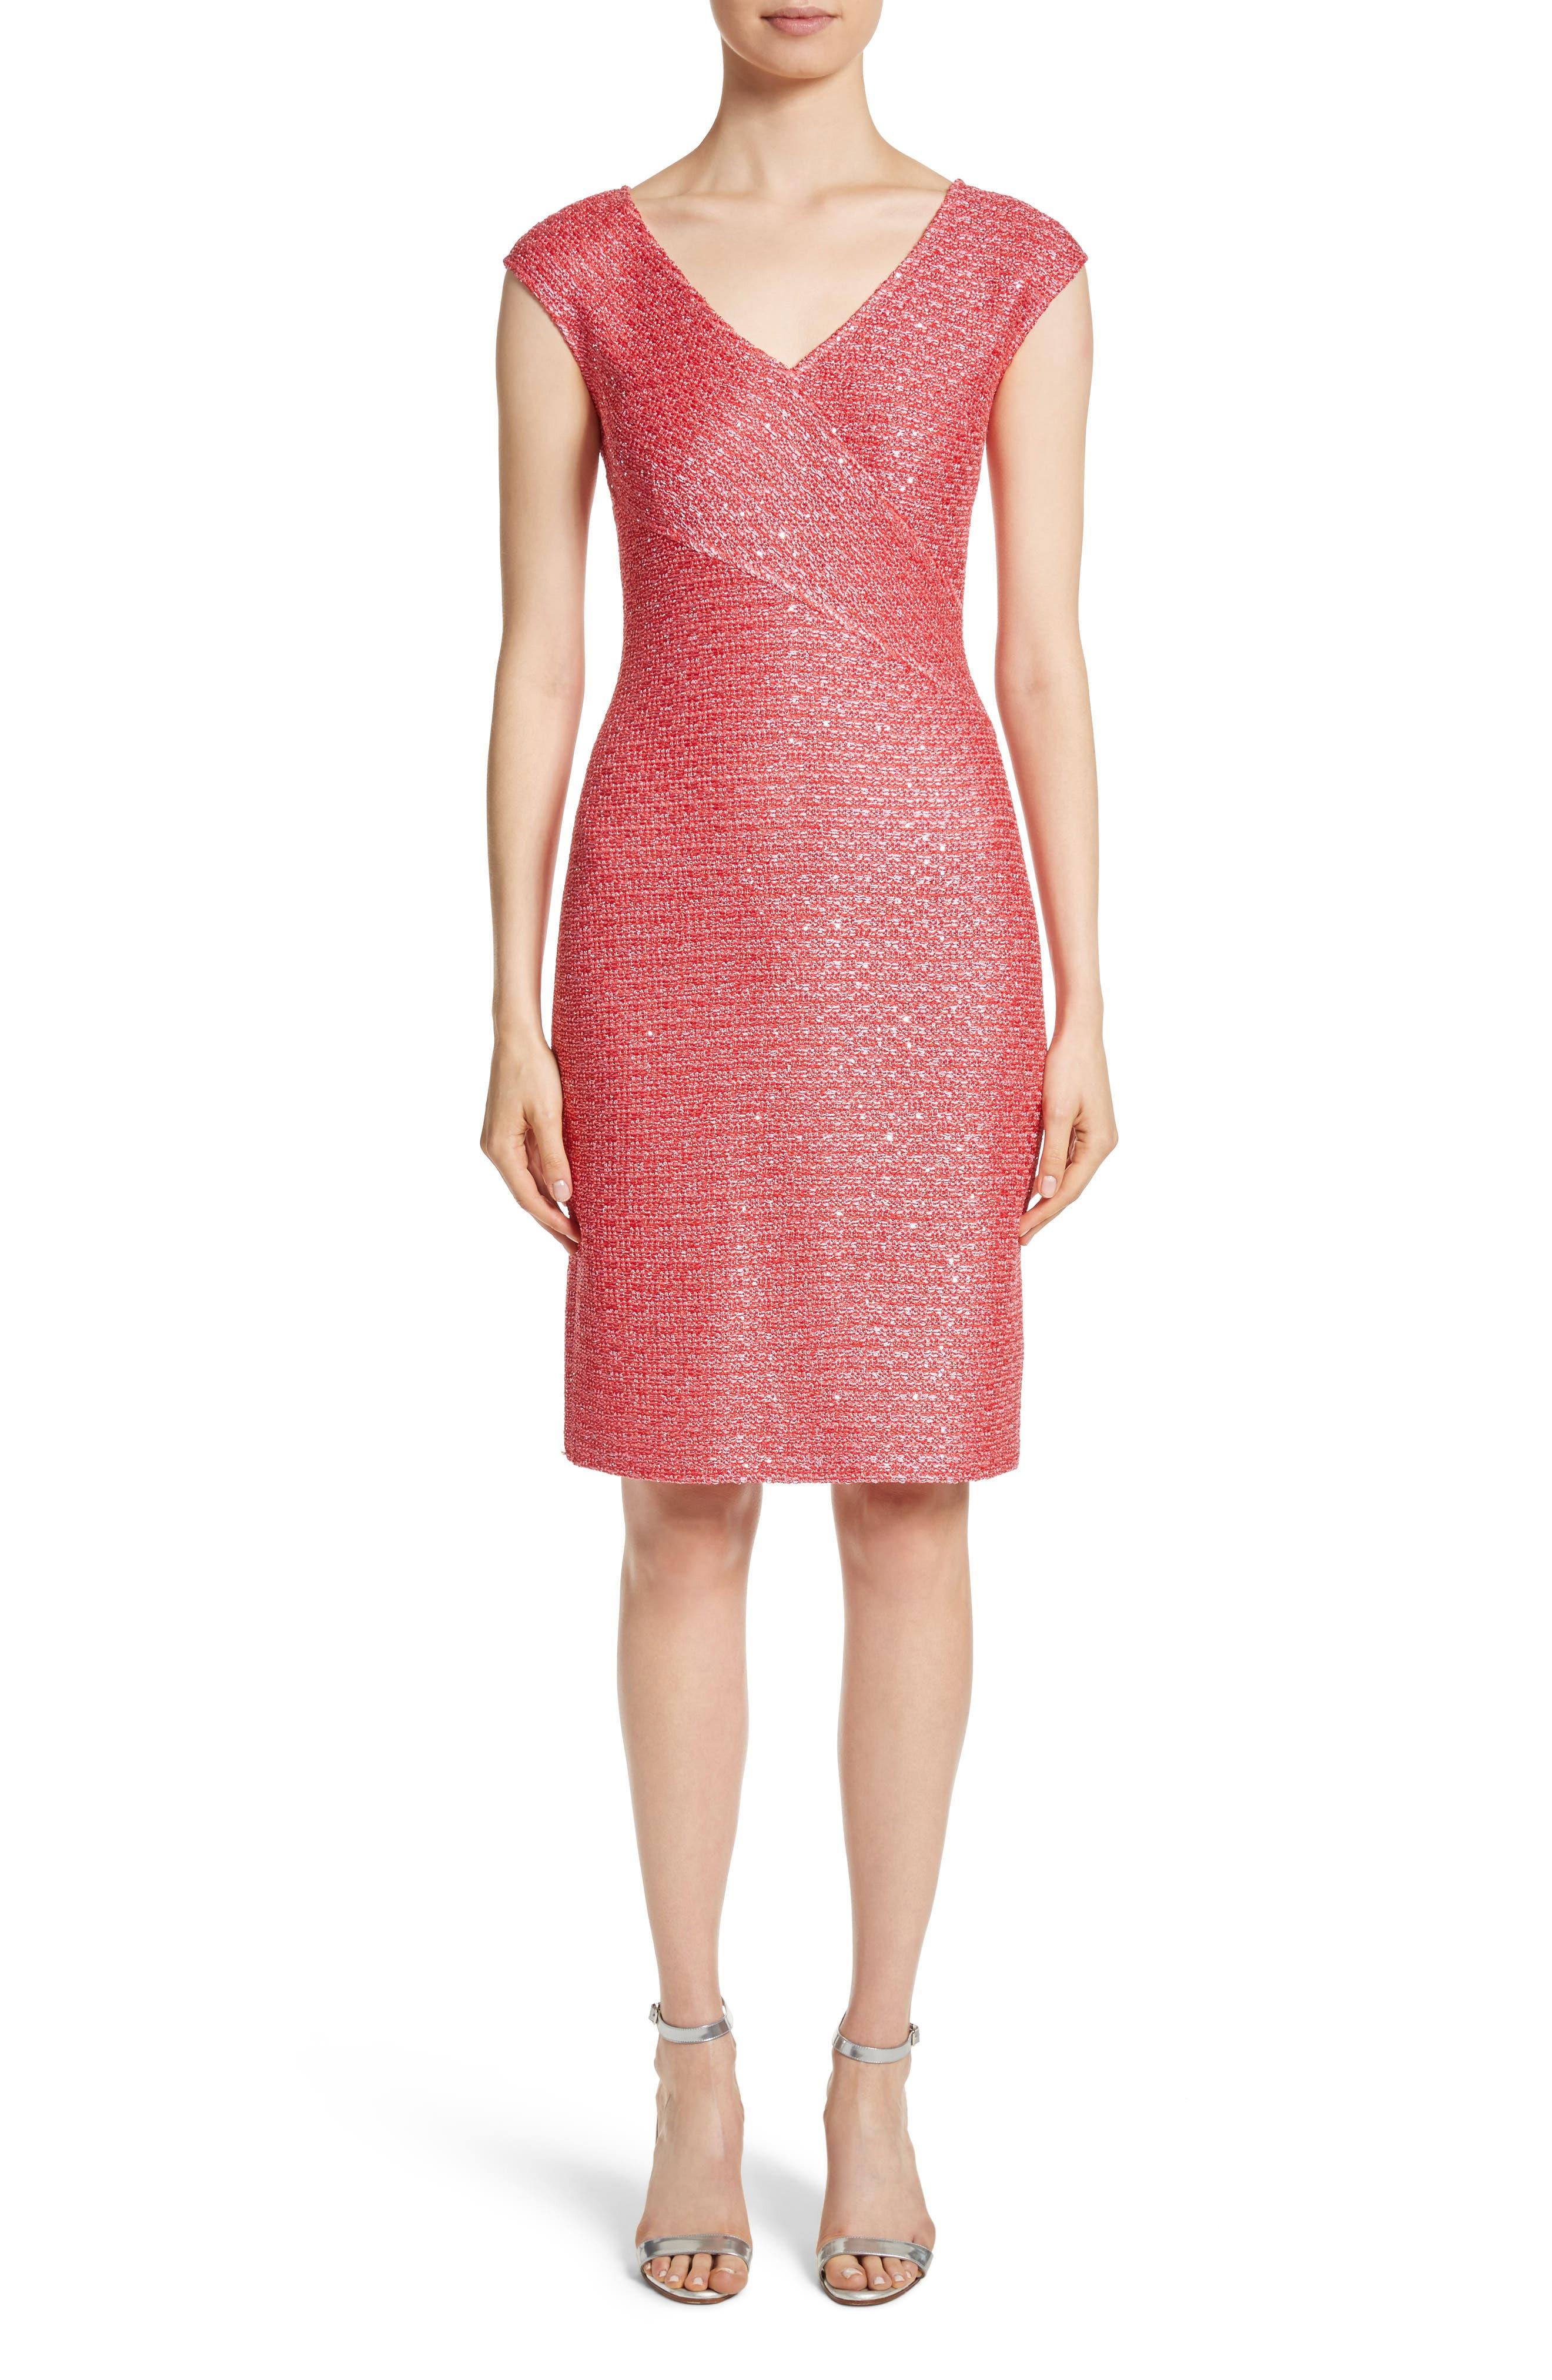 Hansh Knit Dress,                         Main,                         color, Coral Multi